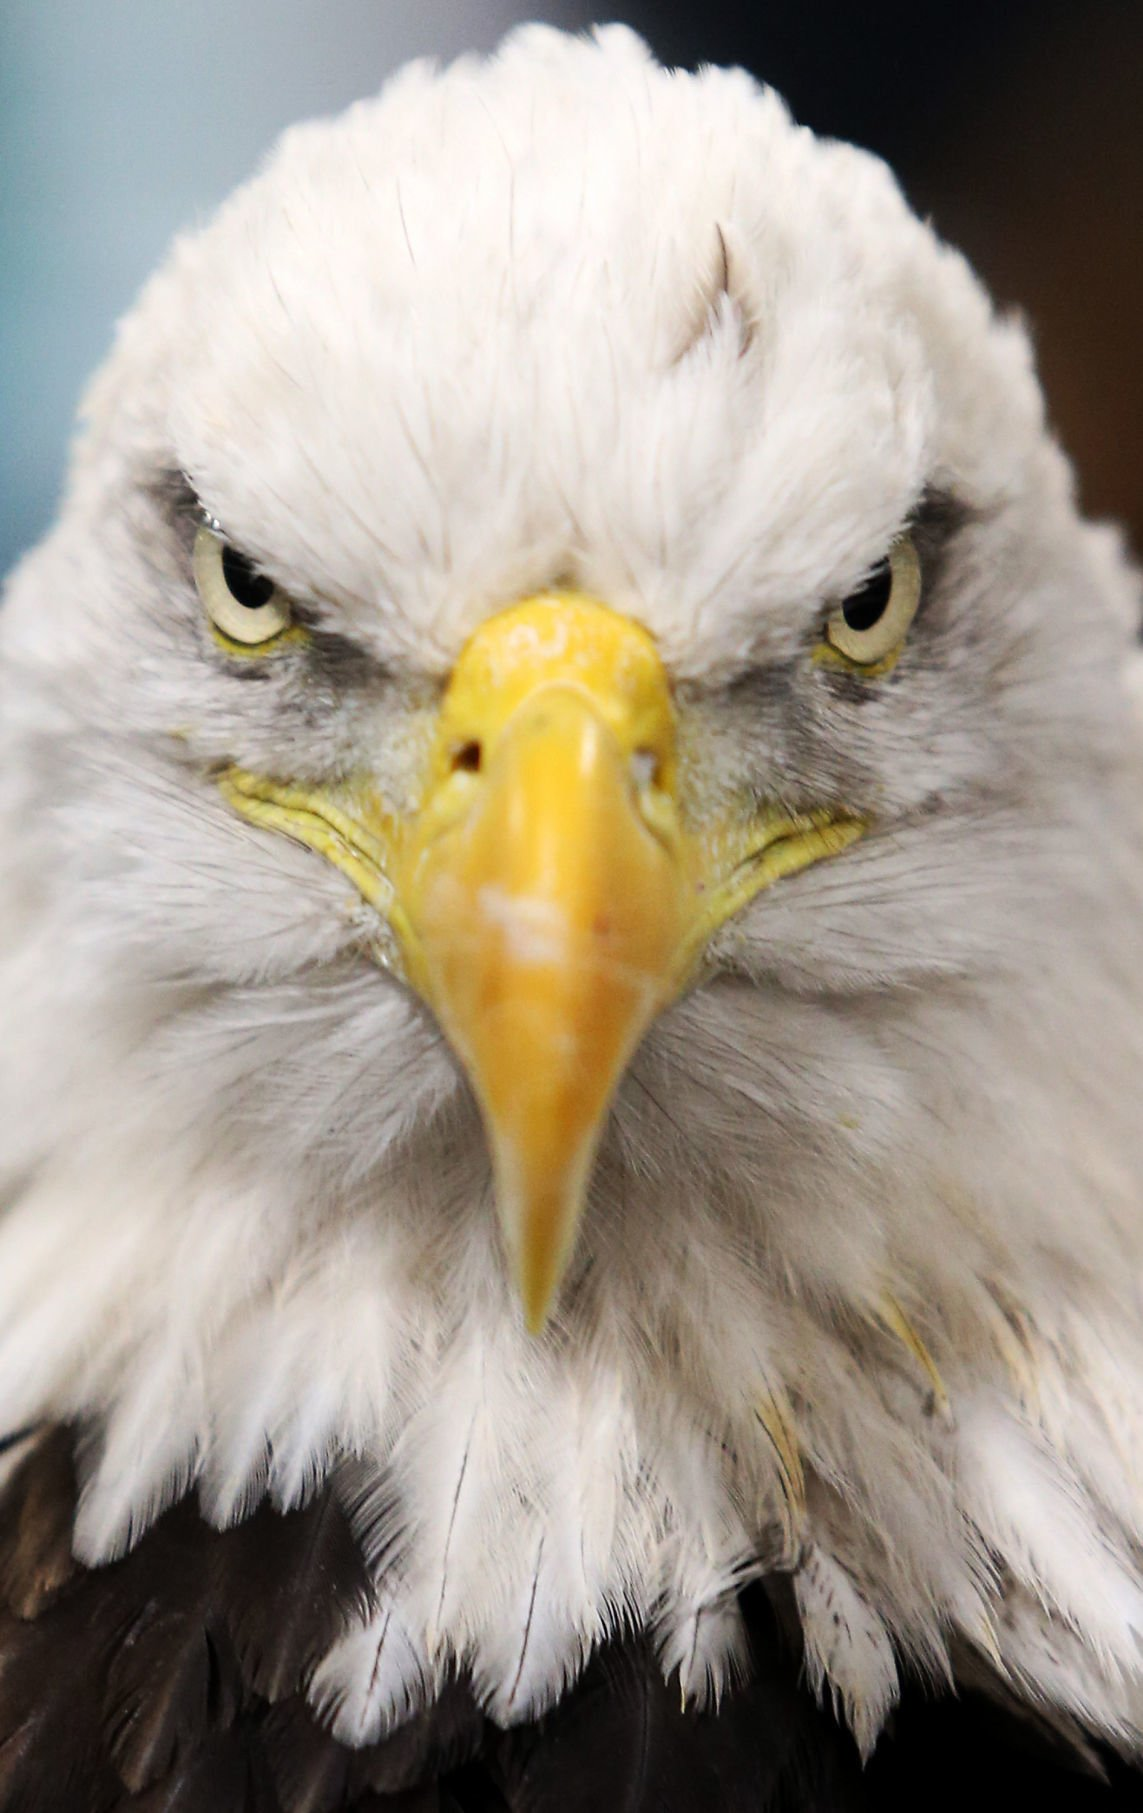 010518-Bald-Eagle-Days-2018-002